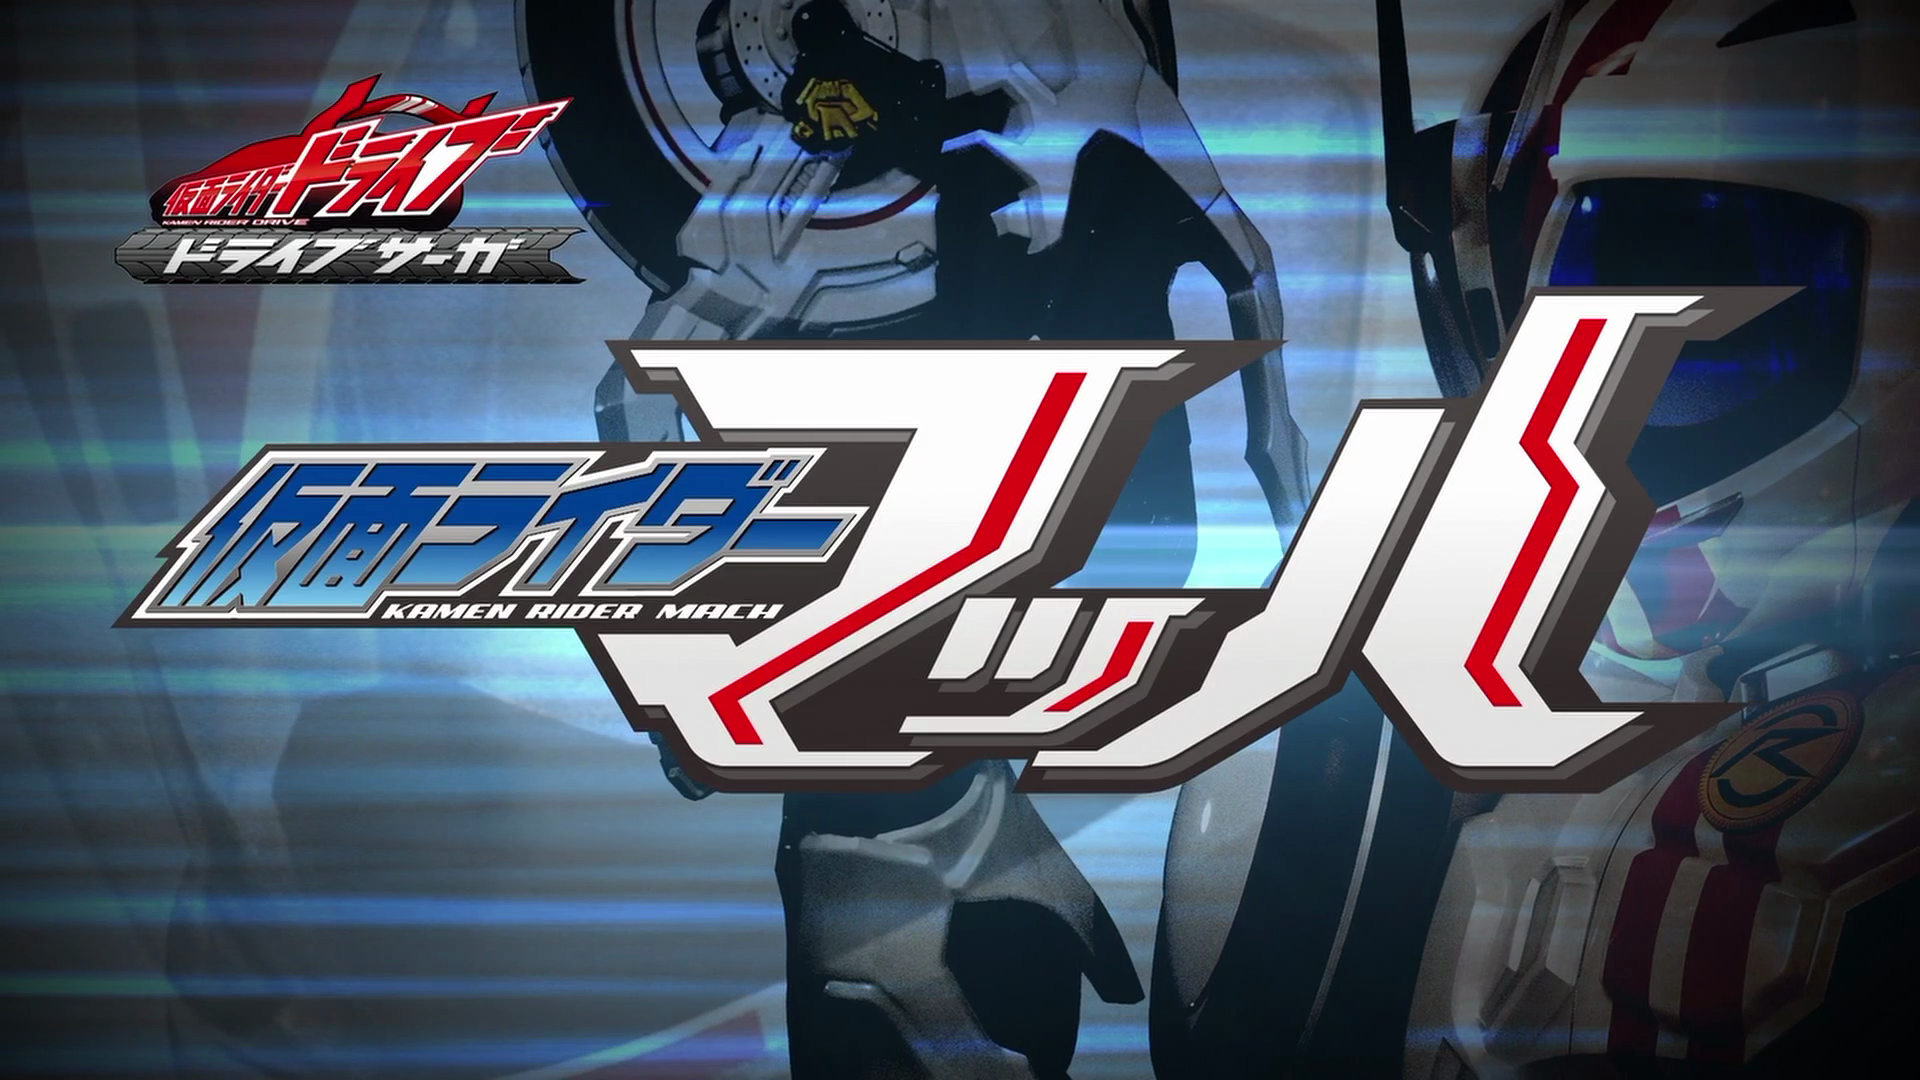 Kamen Rider Drive Saga: Kamen Rider Mach